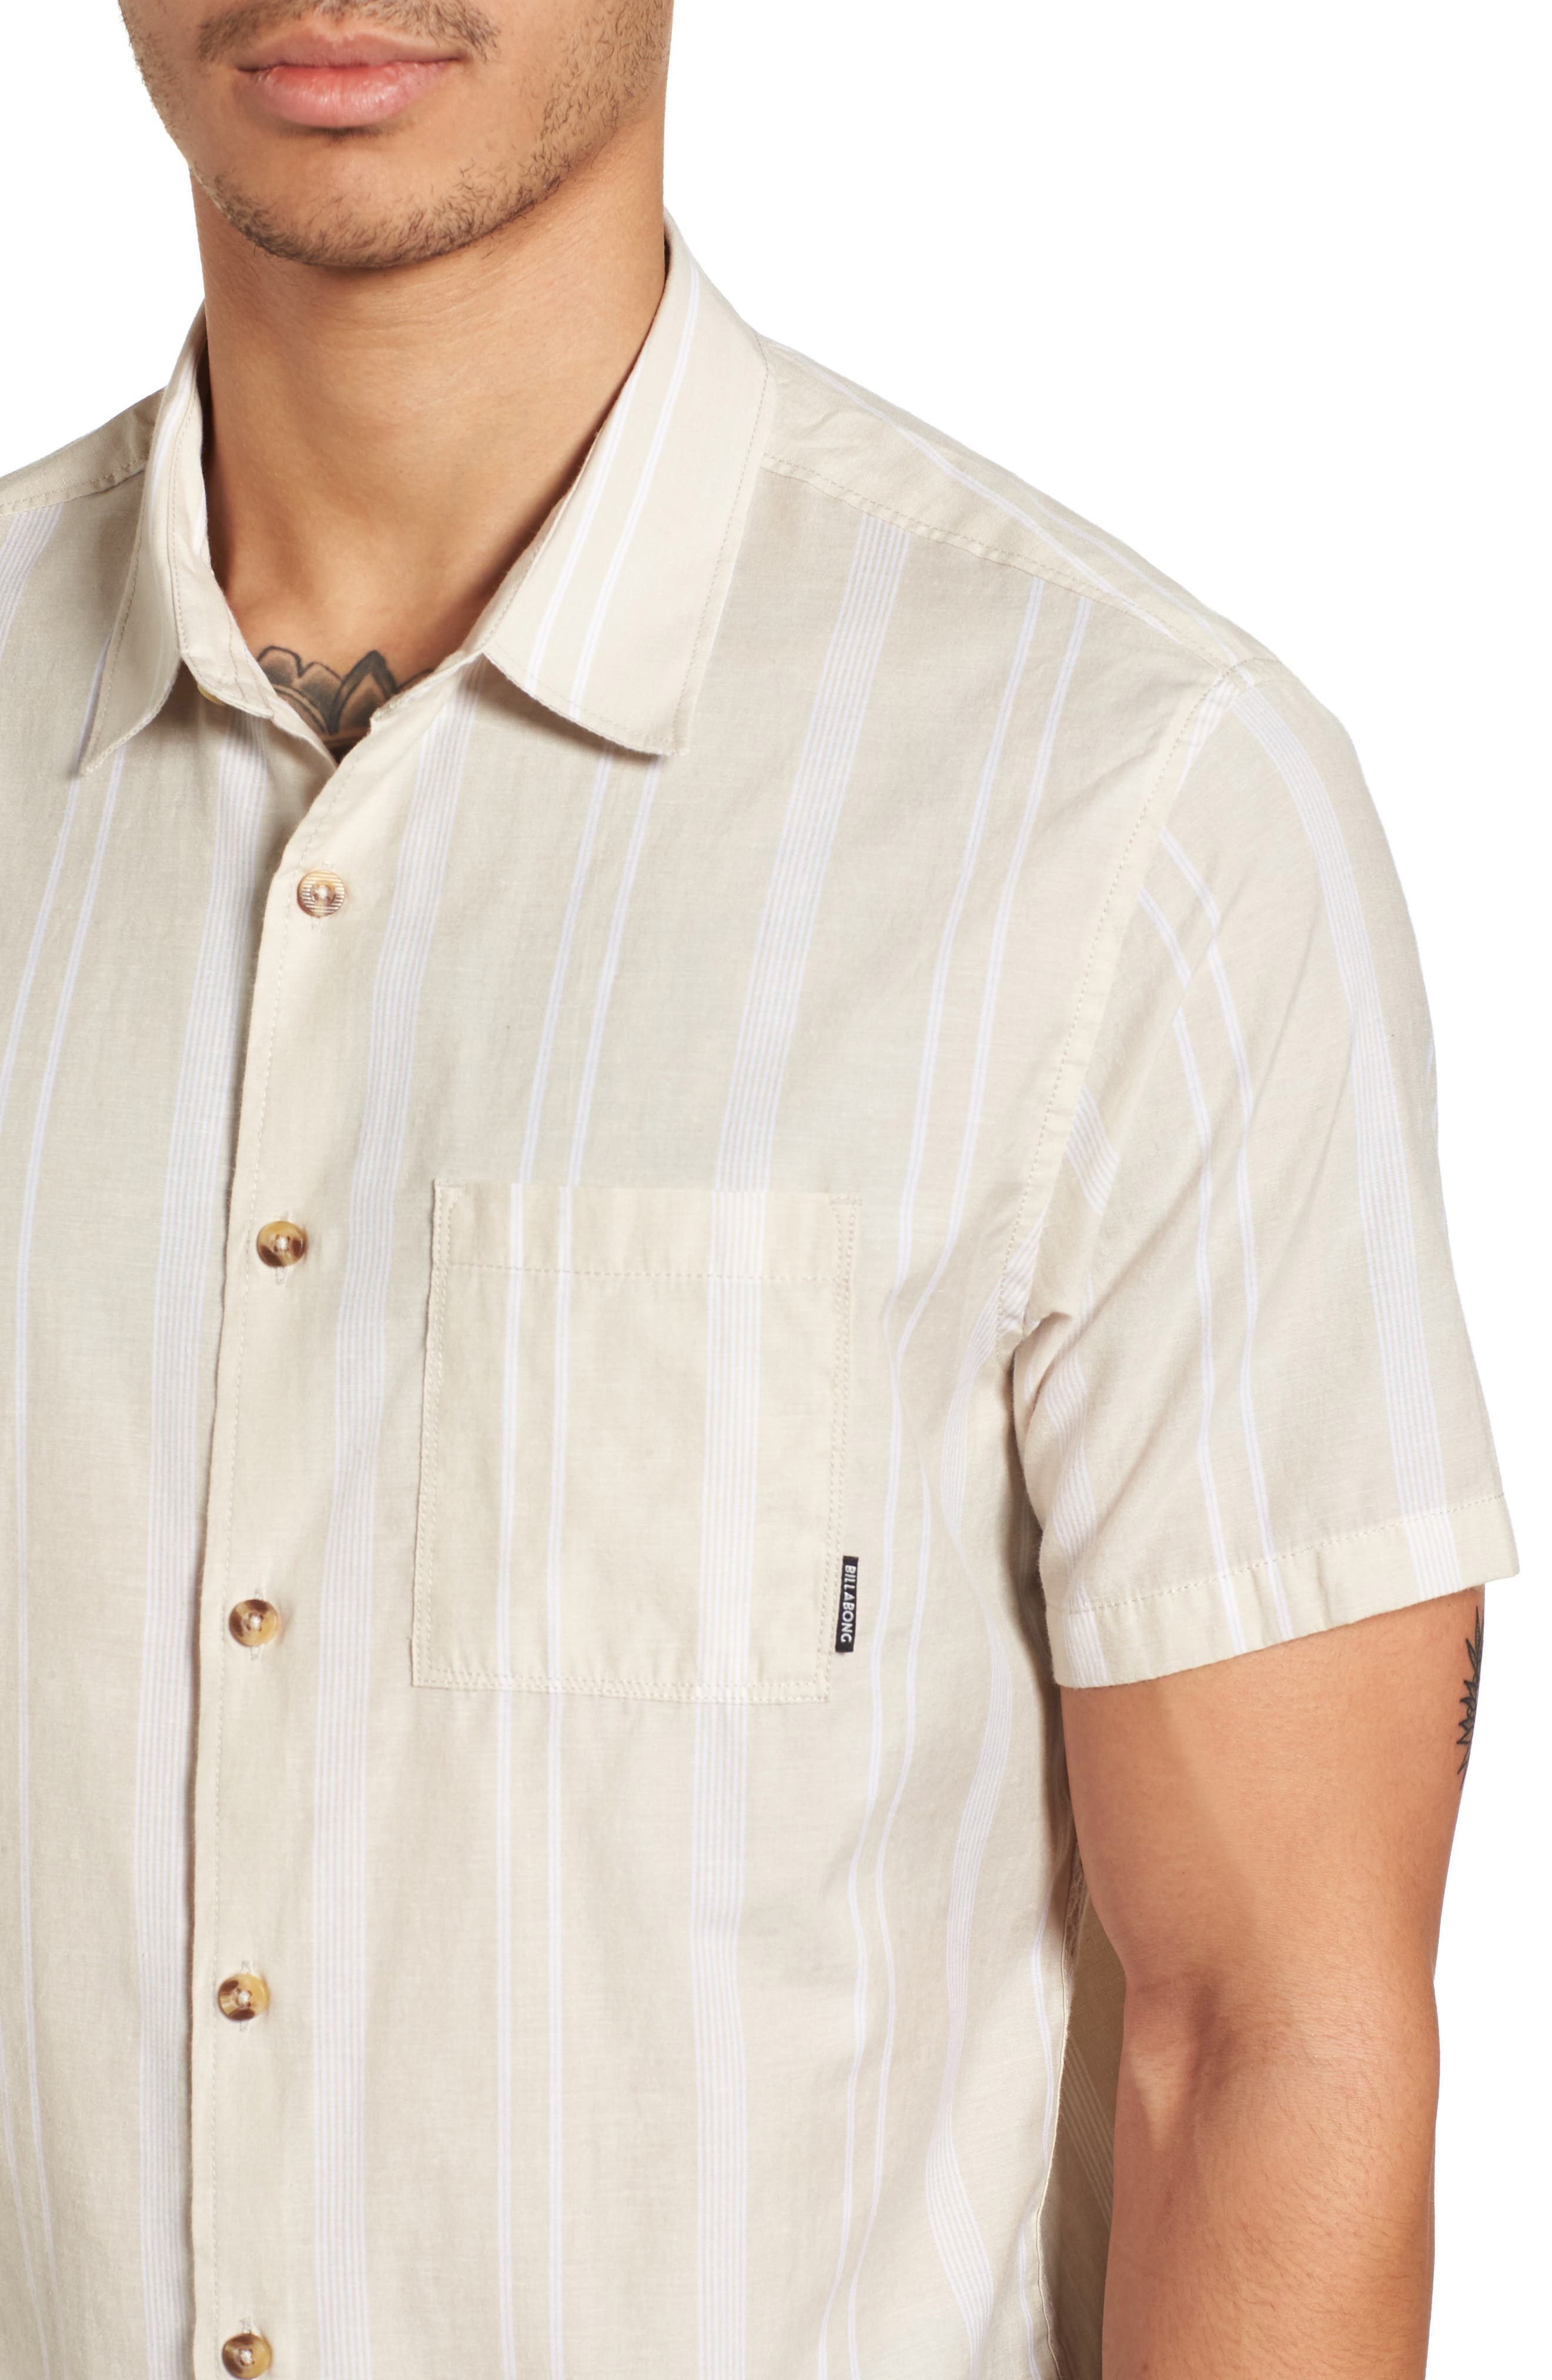 Donny Short Sleeve Shirt,                             Alternate thumbnail 2, color,                             Sand